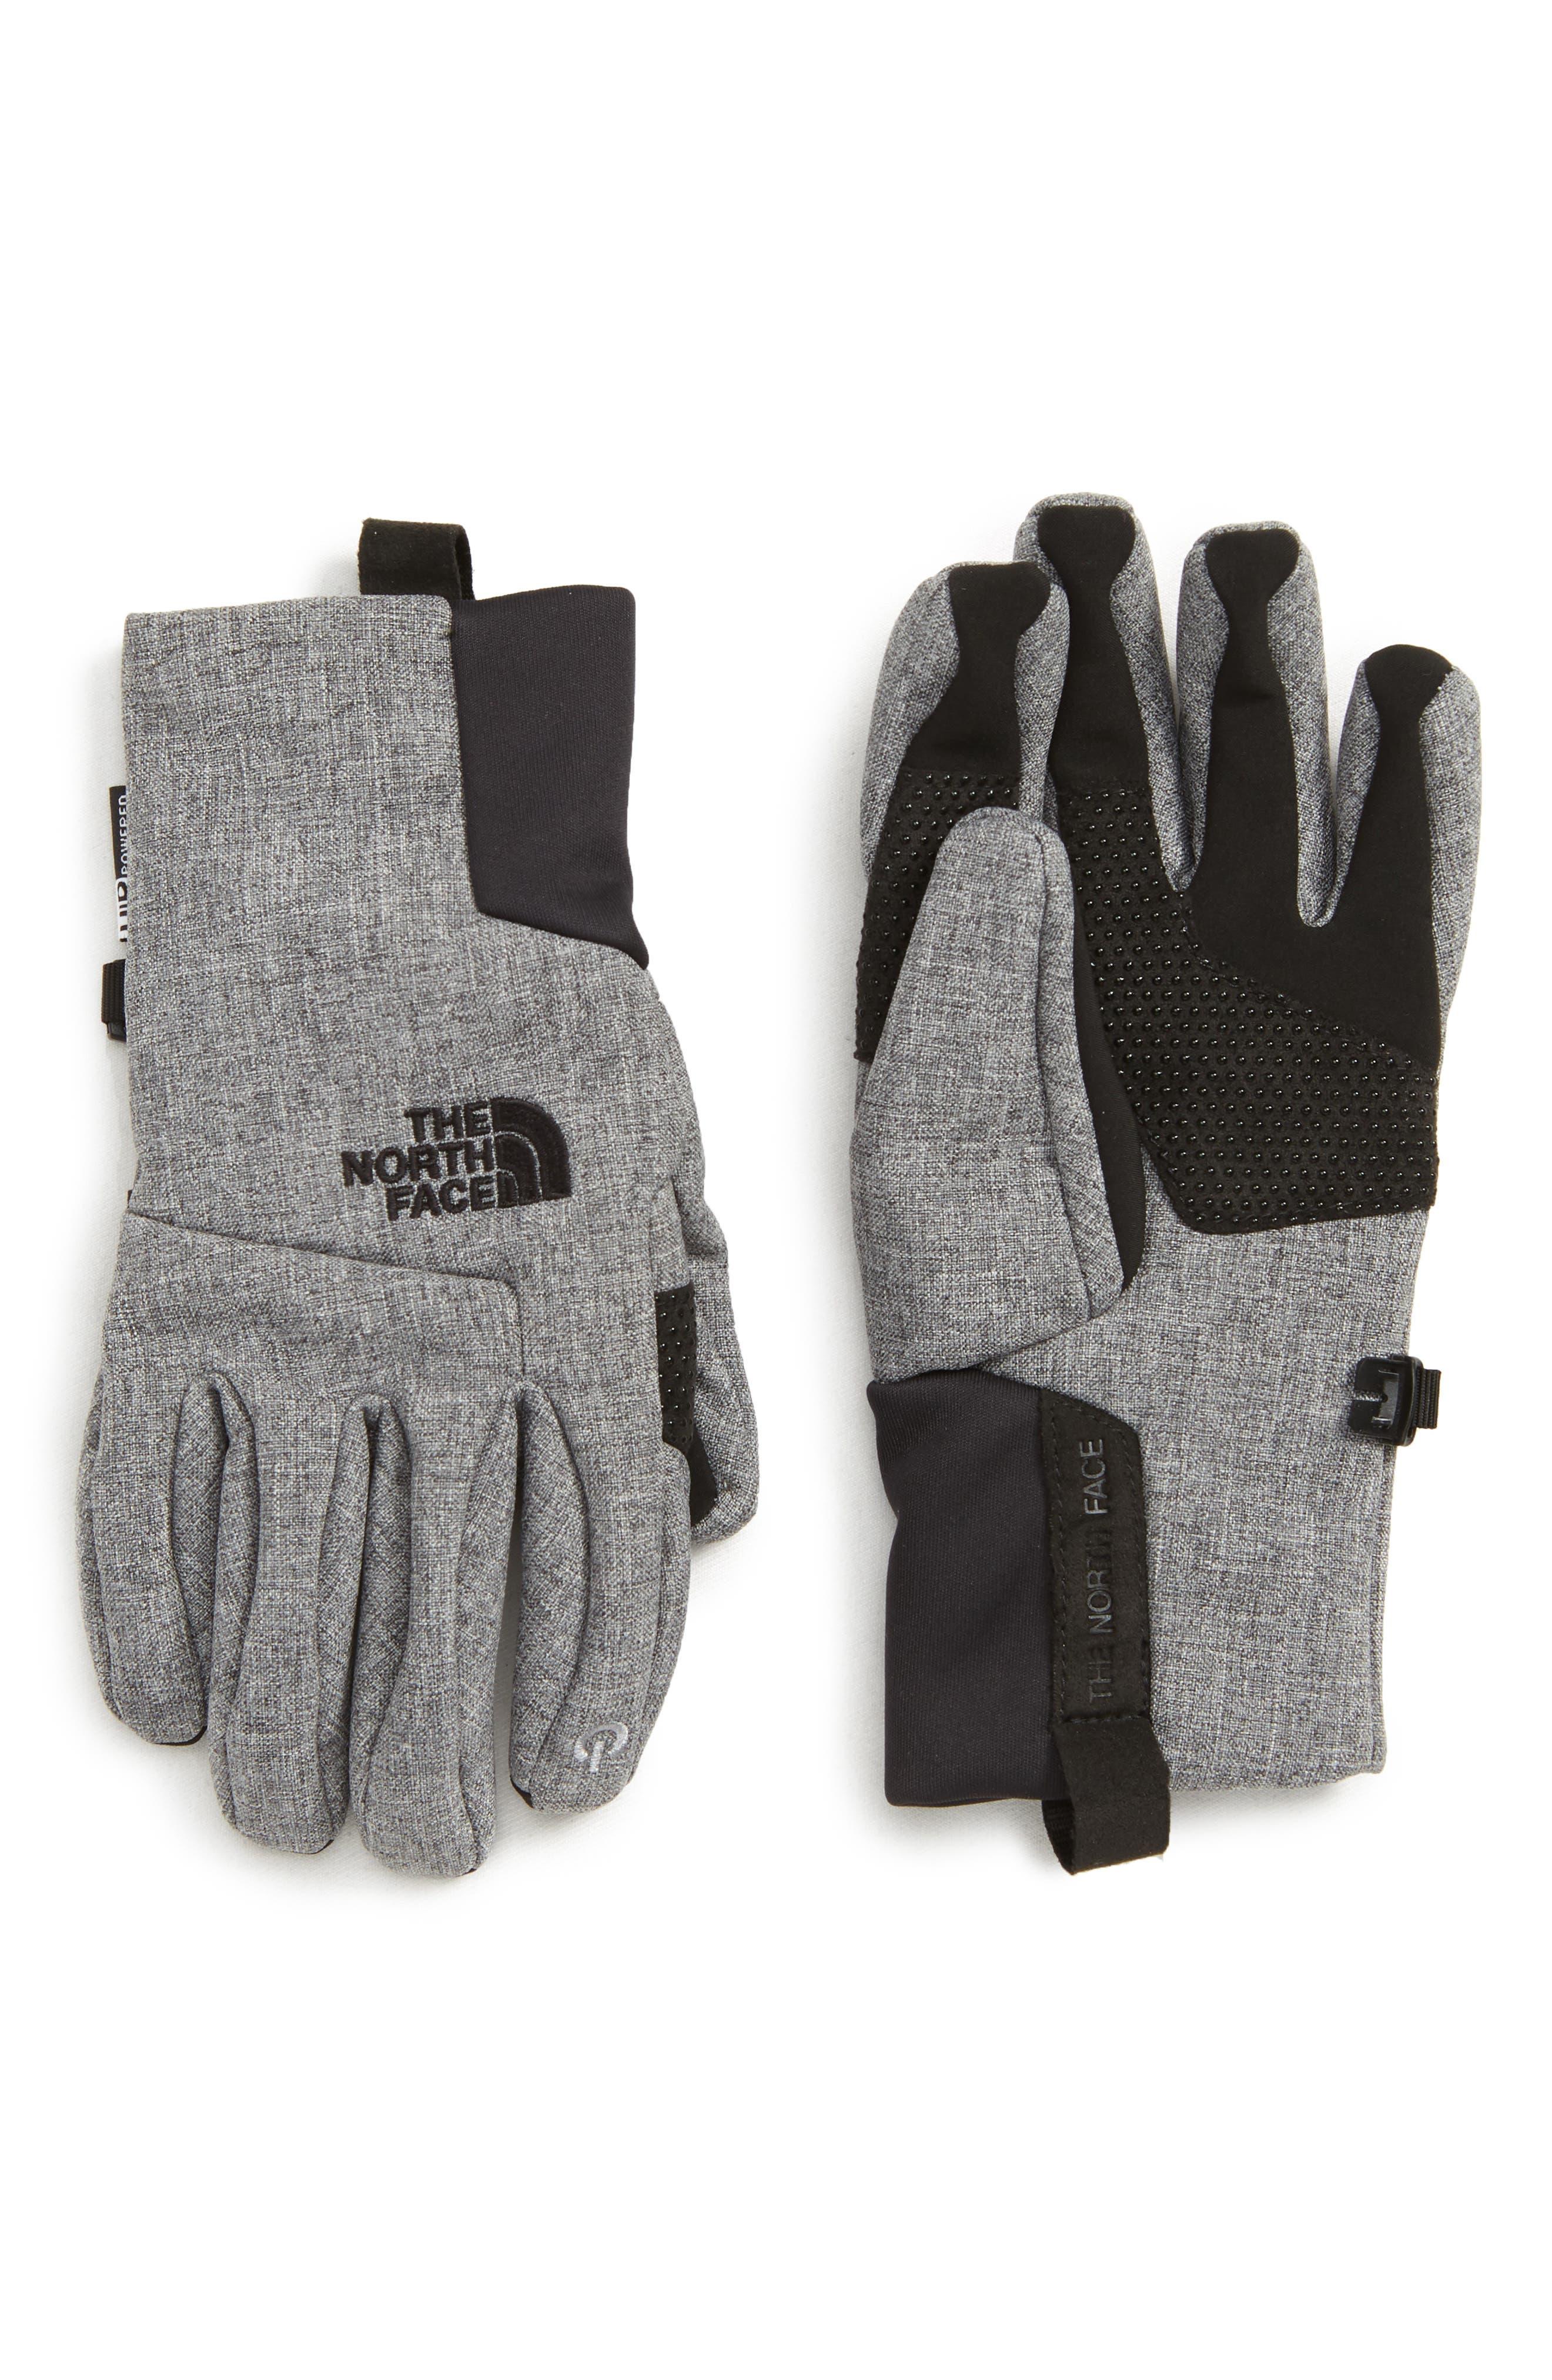 Apex Etip<sup>™</sup> Tech Gloves,                             Main thumbnail 1, color,                             MEDIUM GREY HEATHER